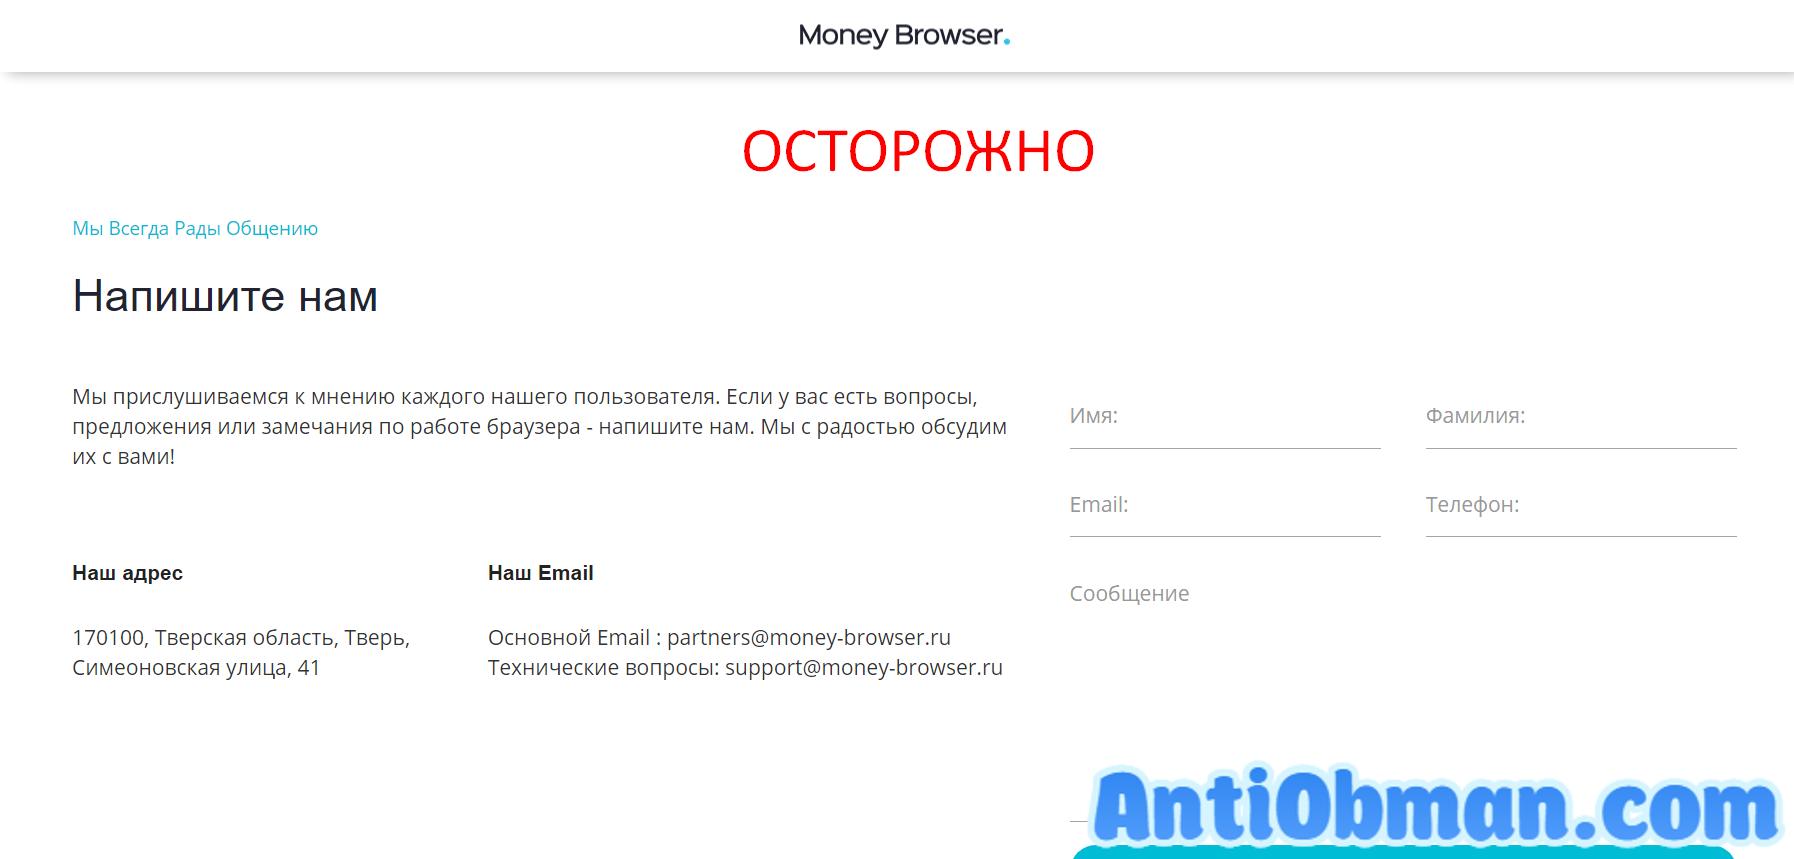 Браузер Money Browser контакты